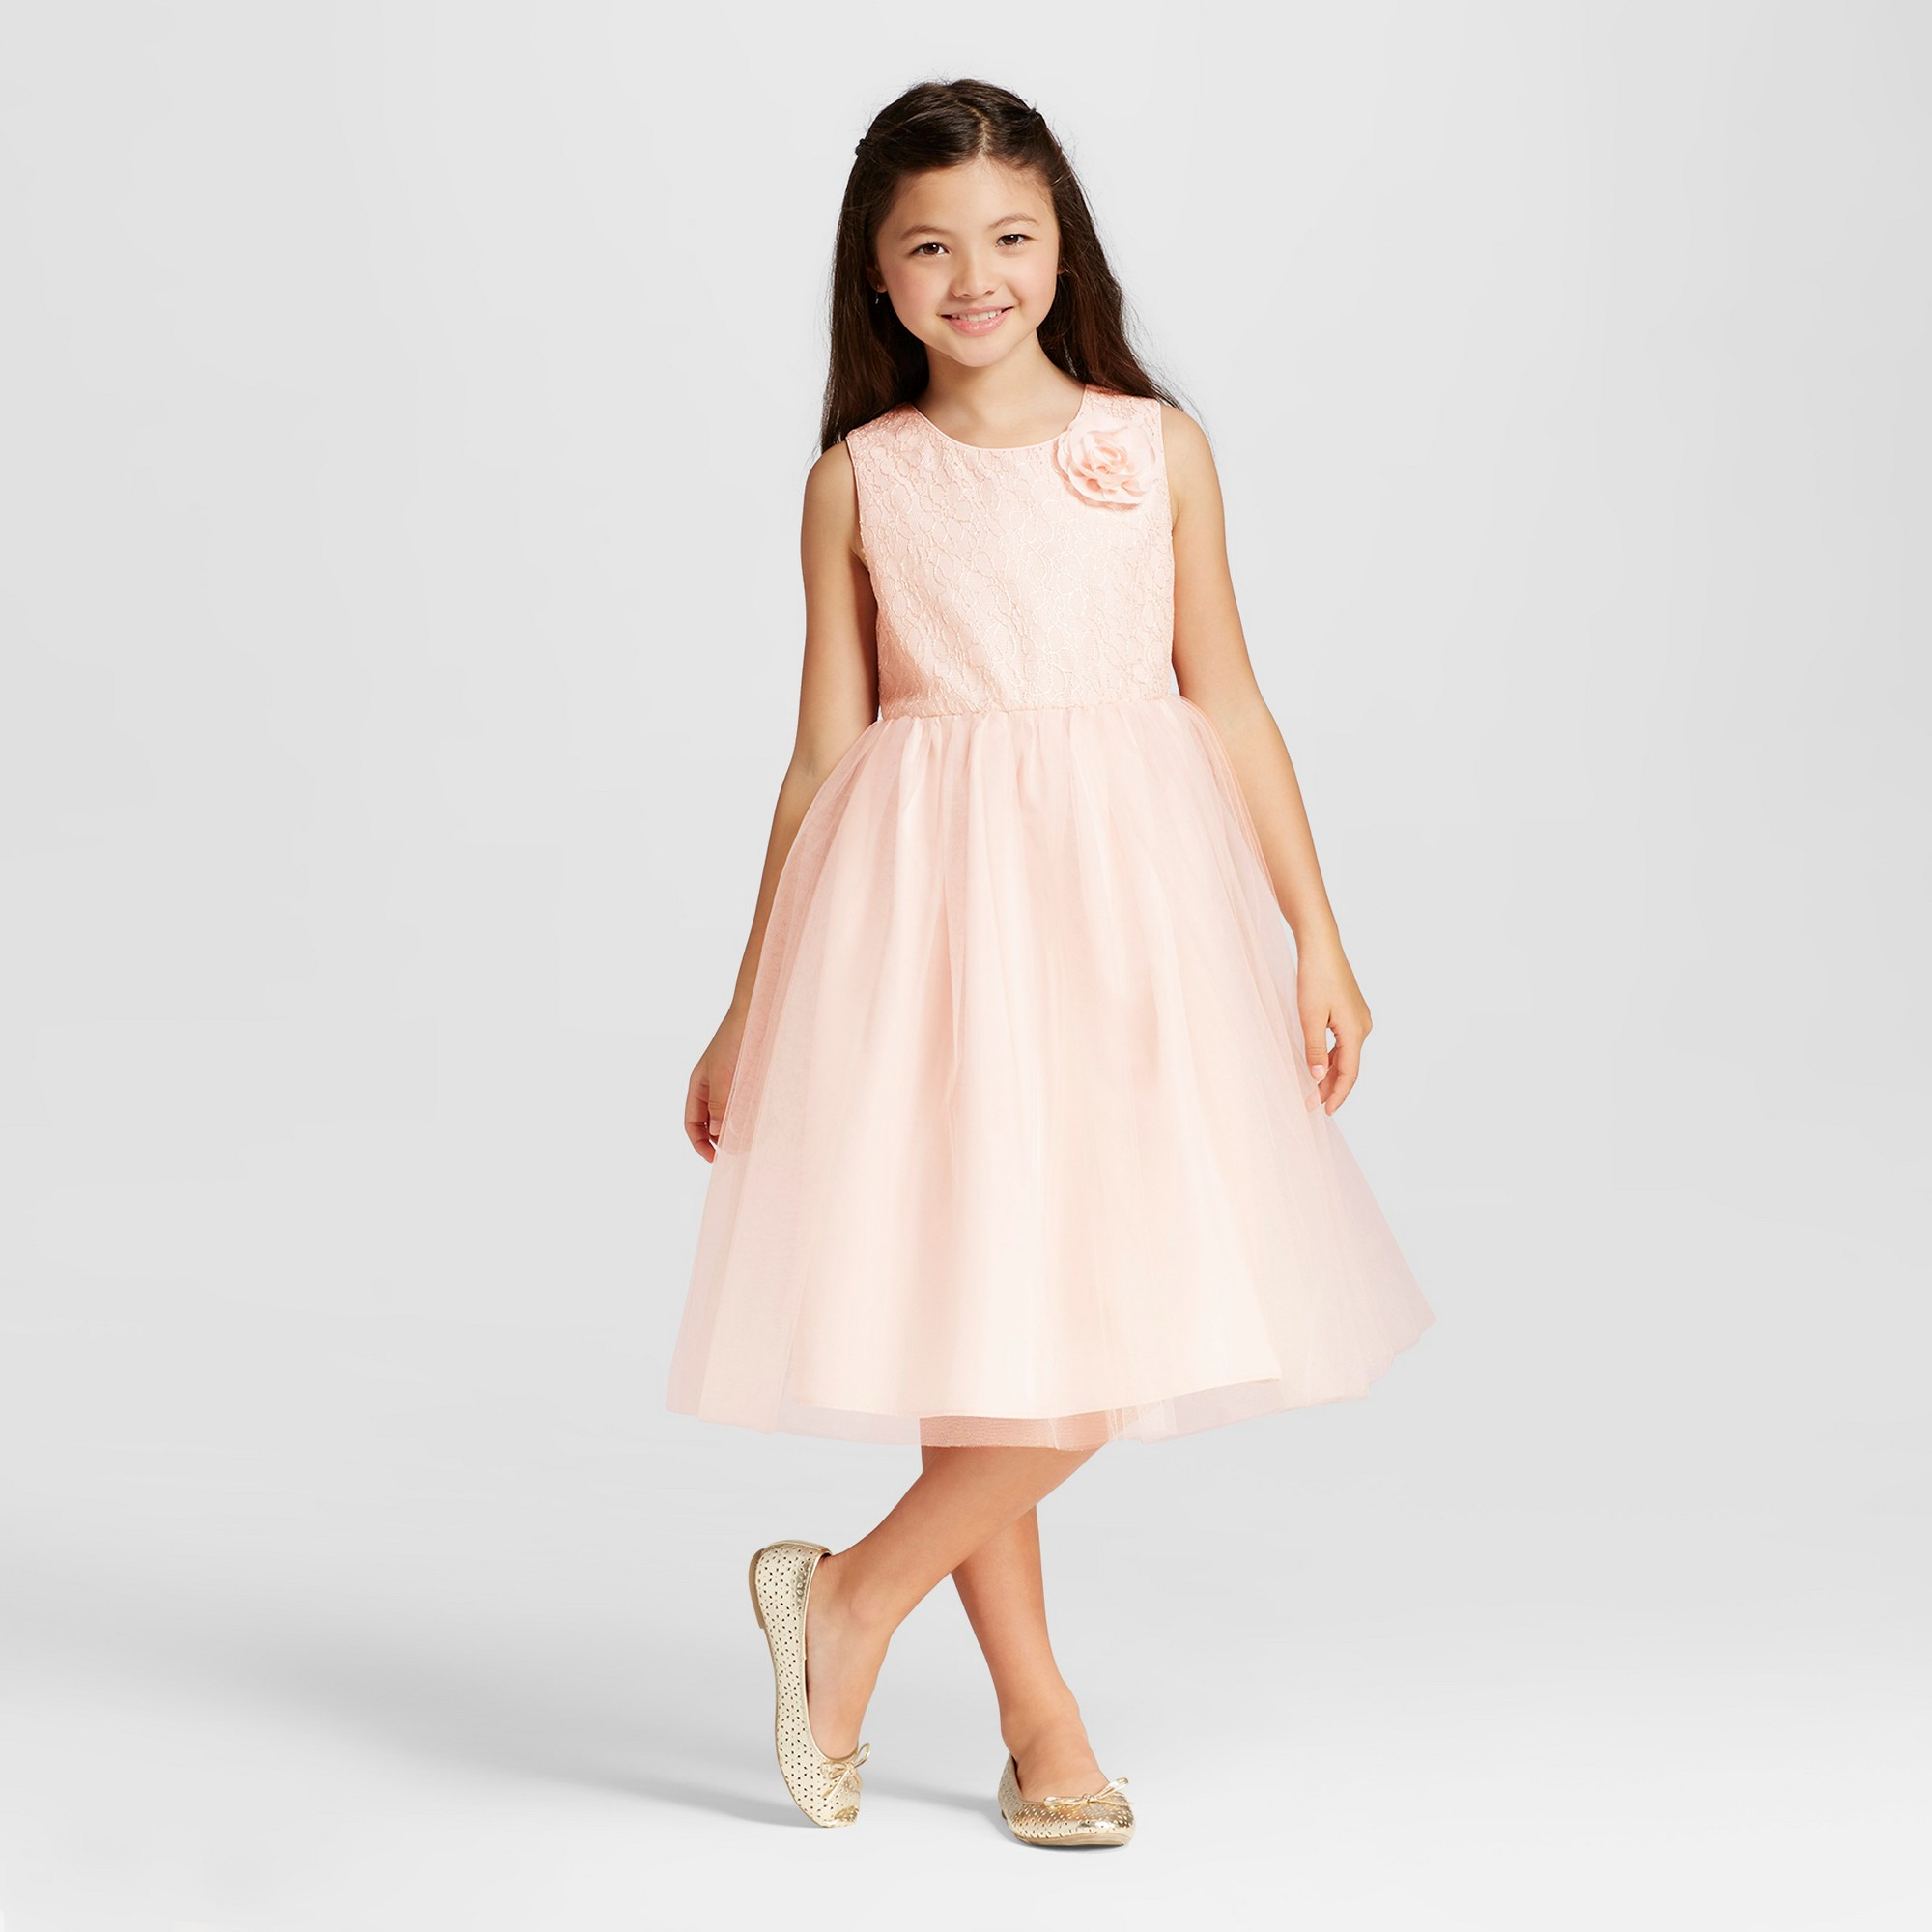 Girls Empire Dress With Flower Peach 12 Tevolio Pale Peach